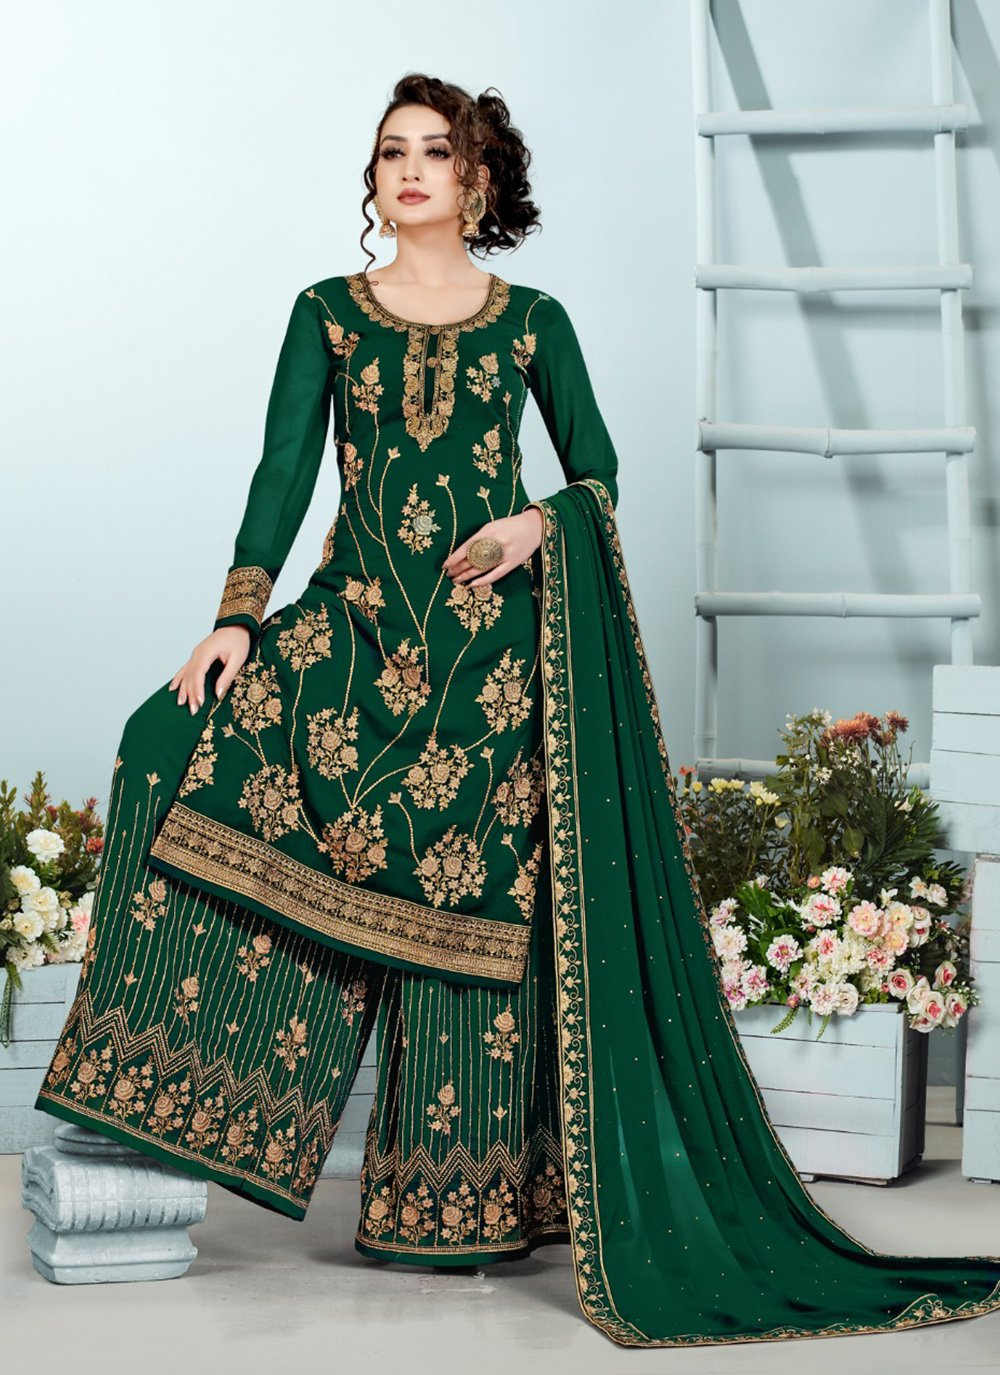 Green Georgette Mehndi Designer Pakistani Suit